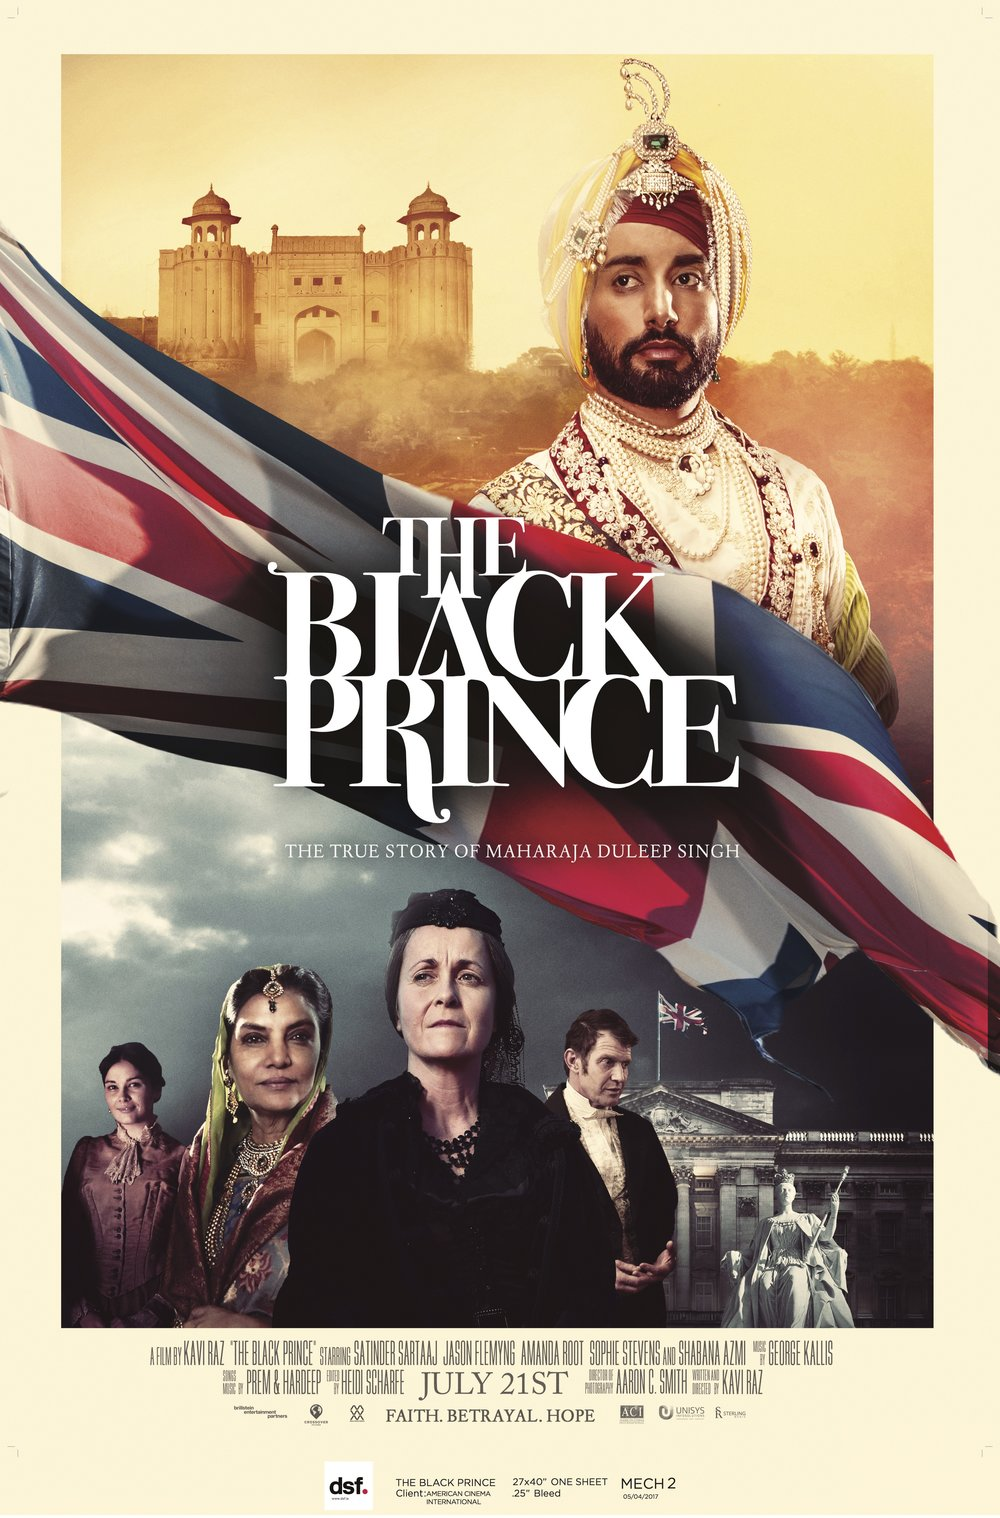 The Black Prince One Sheet 27x40 FINAL May4rd.jpg